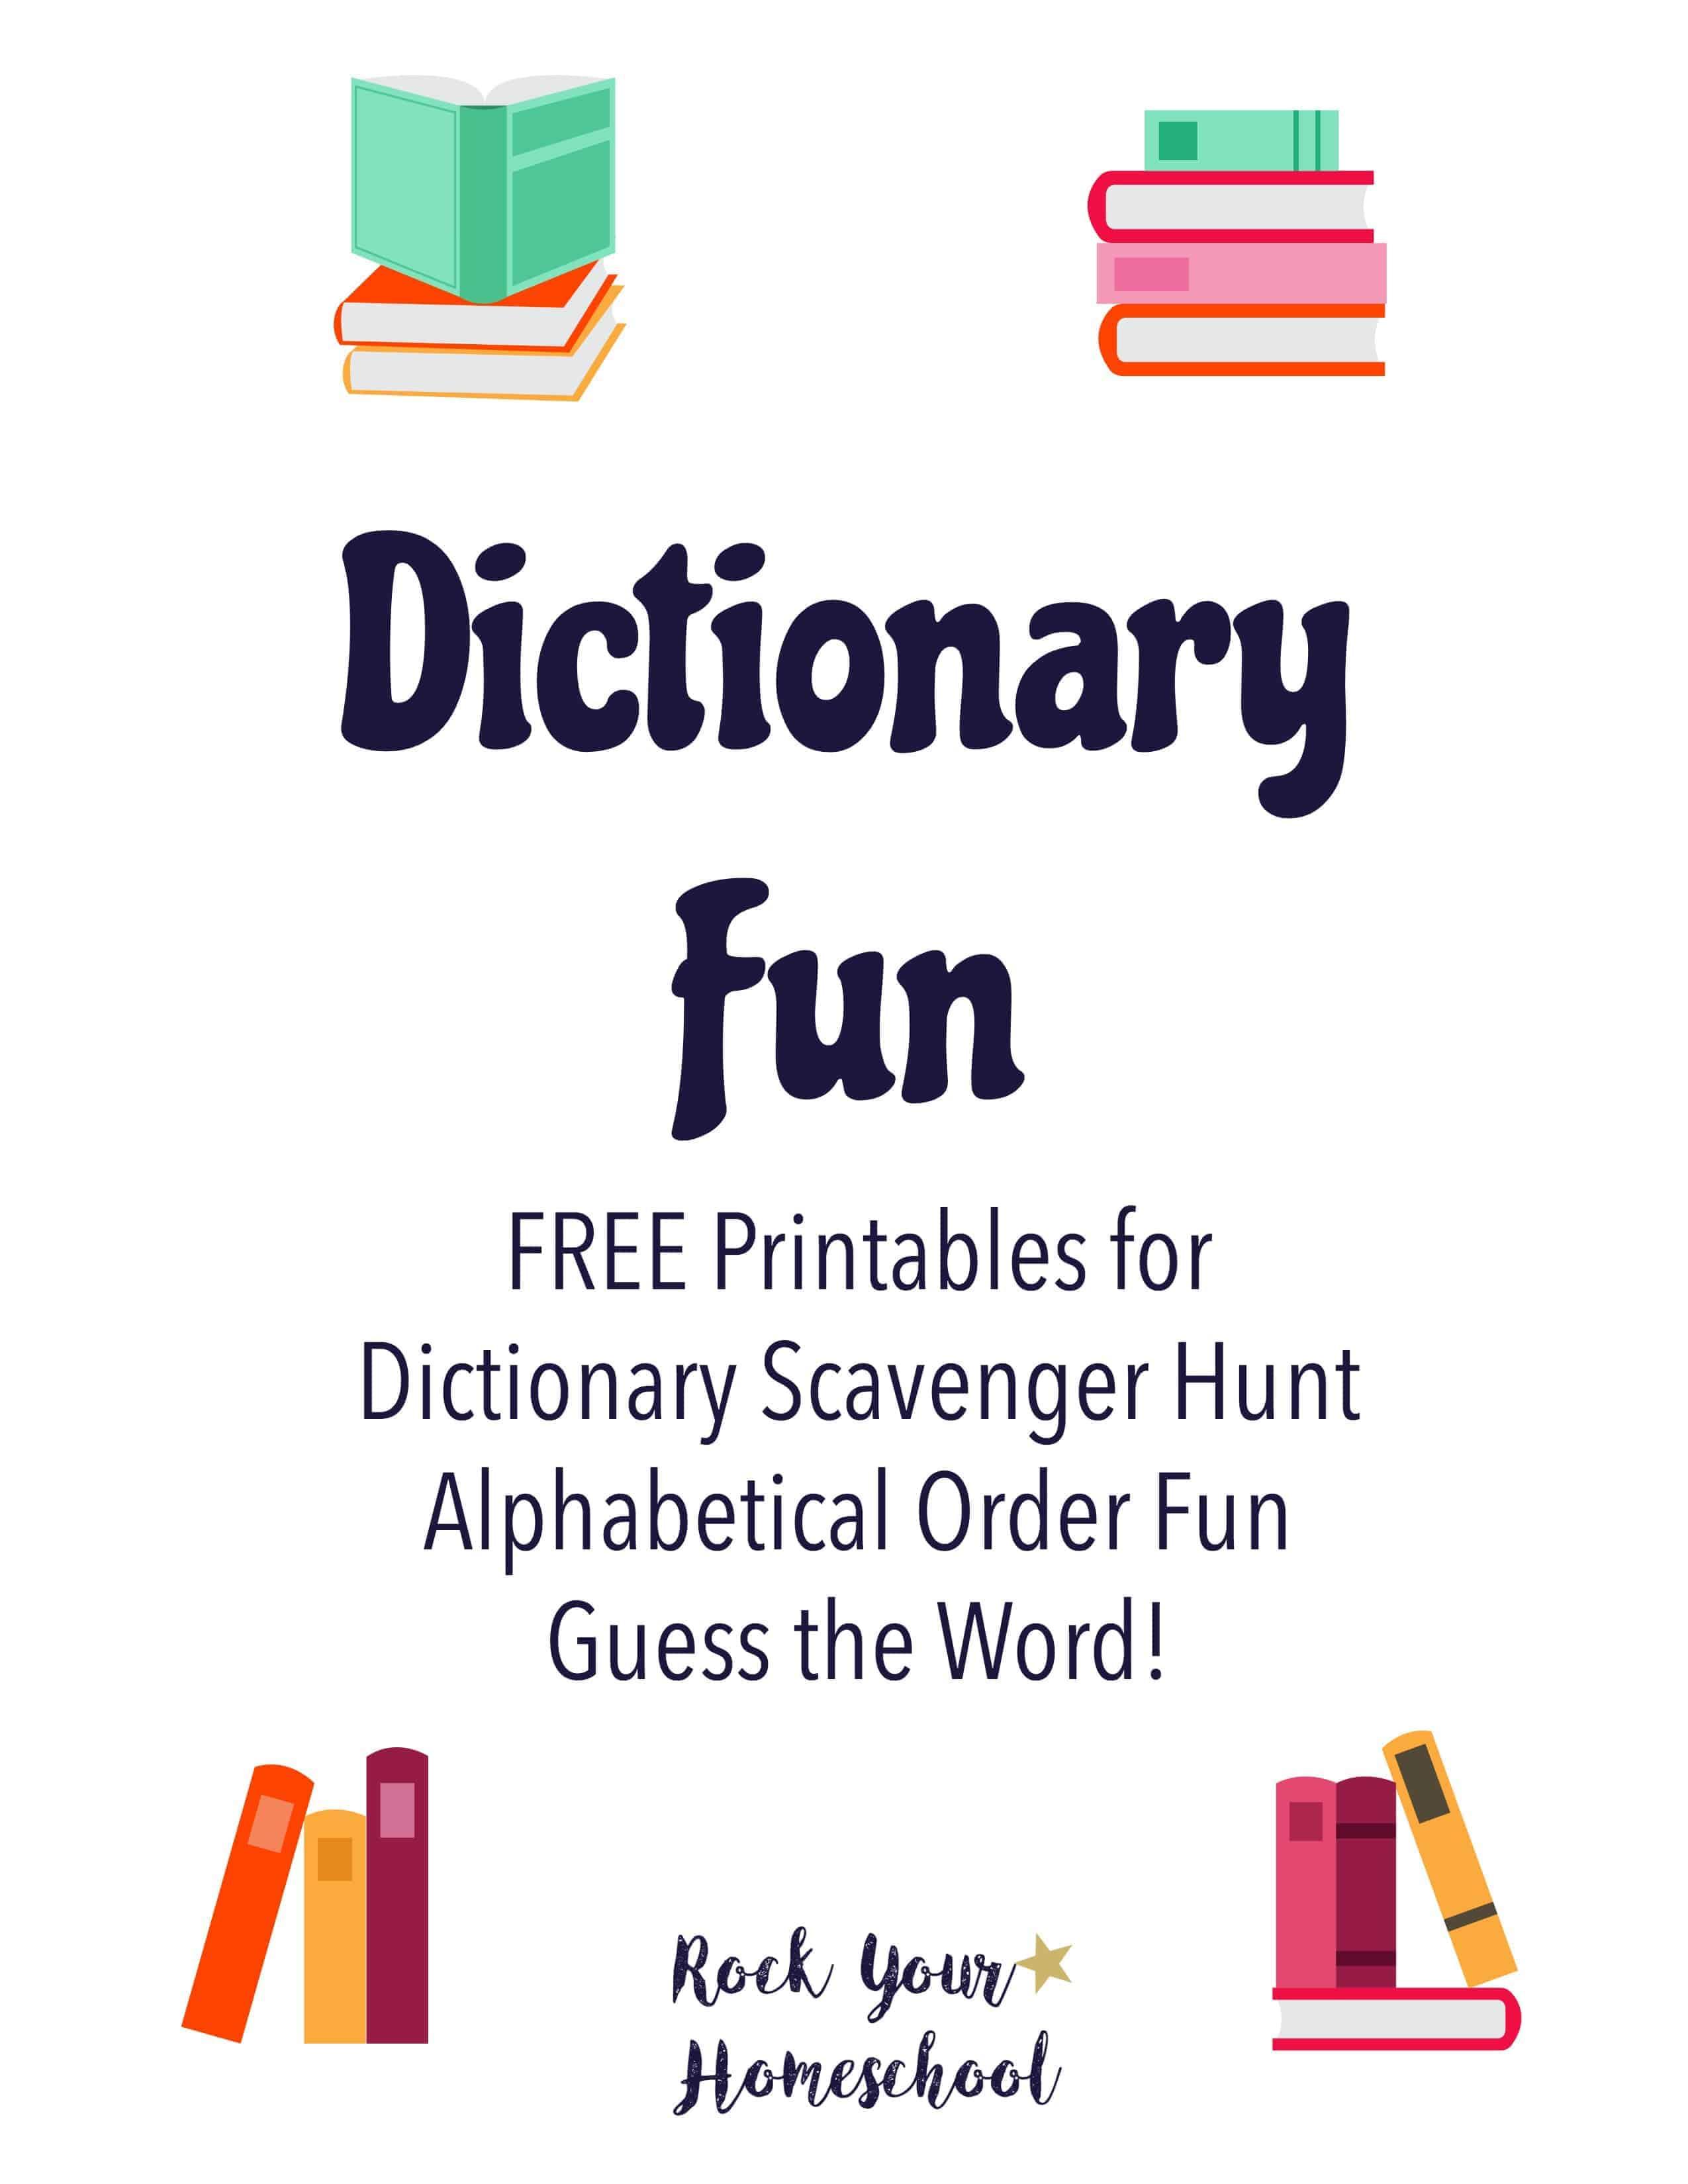 Dictionary Fun Printables